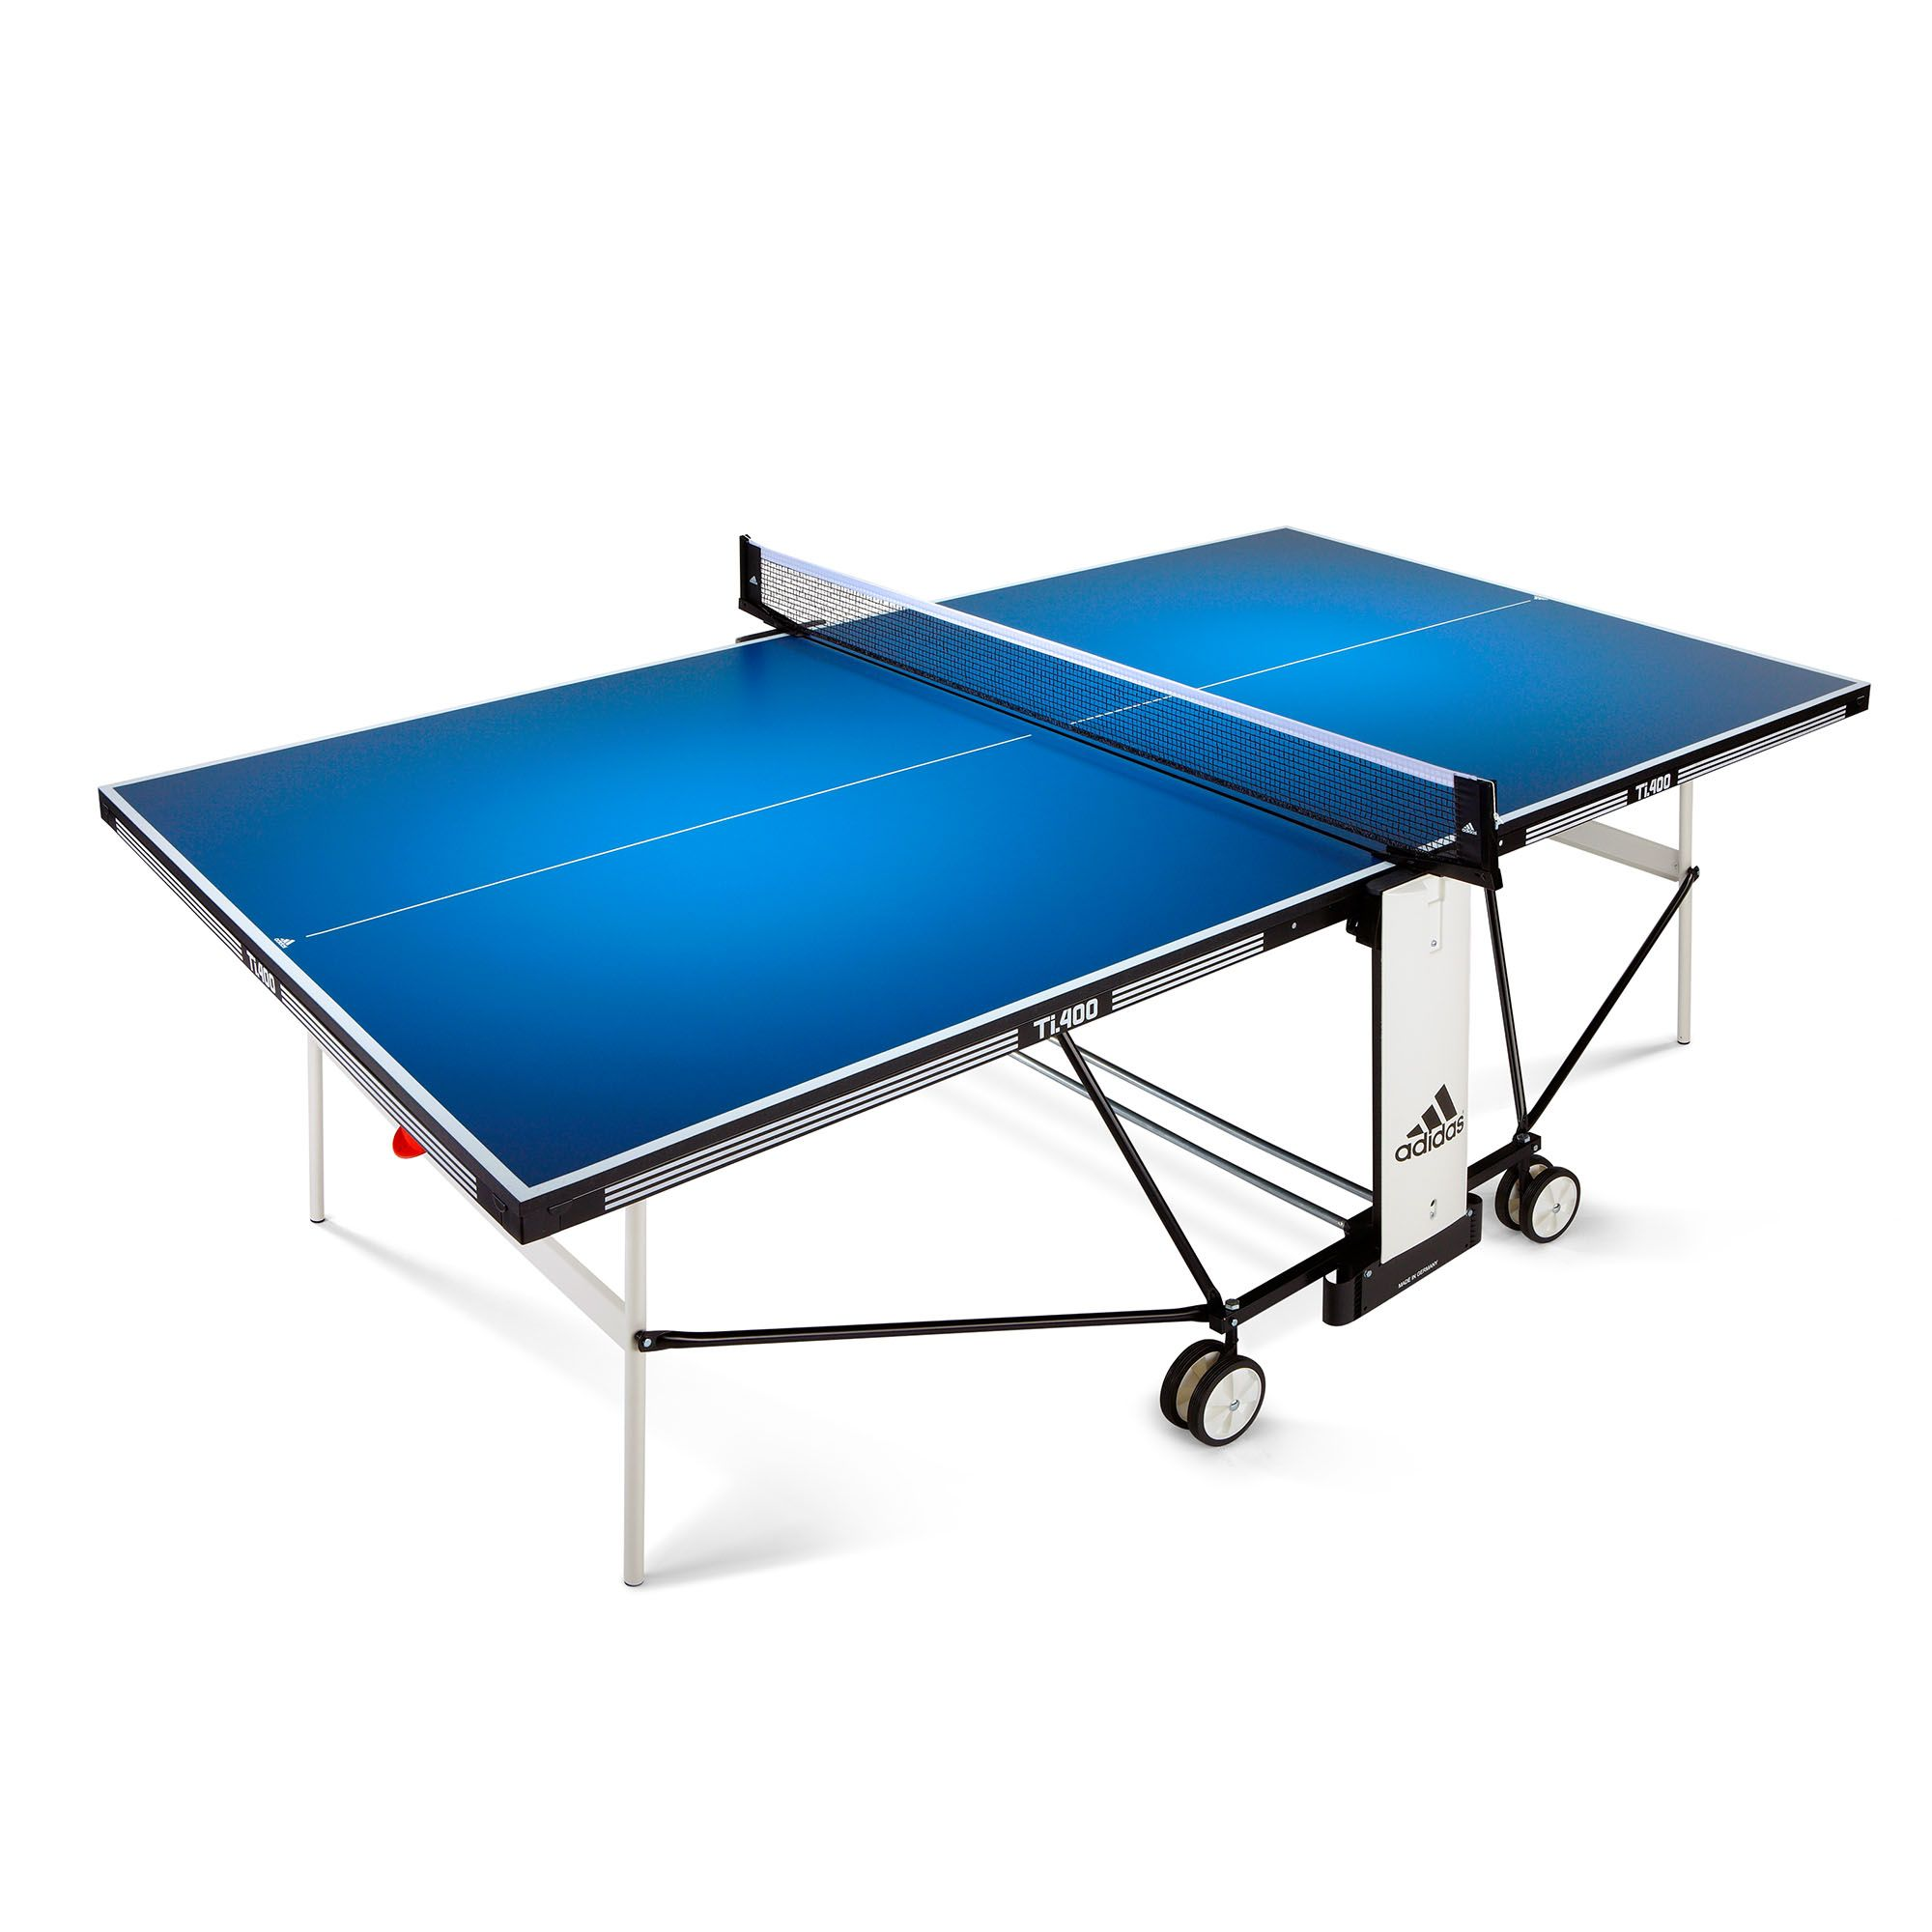 adidas ti 400 indoor table tennis table